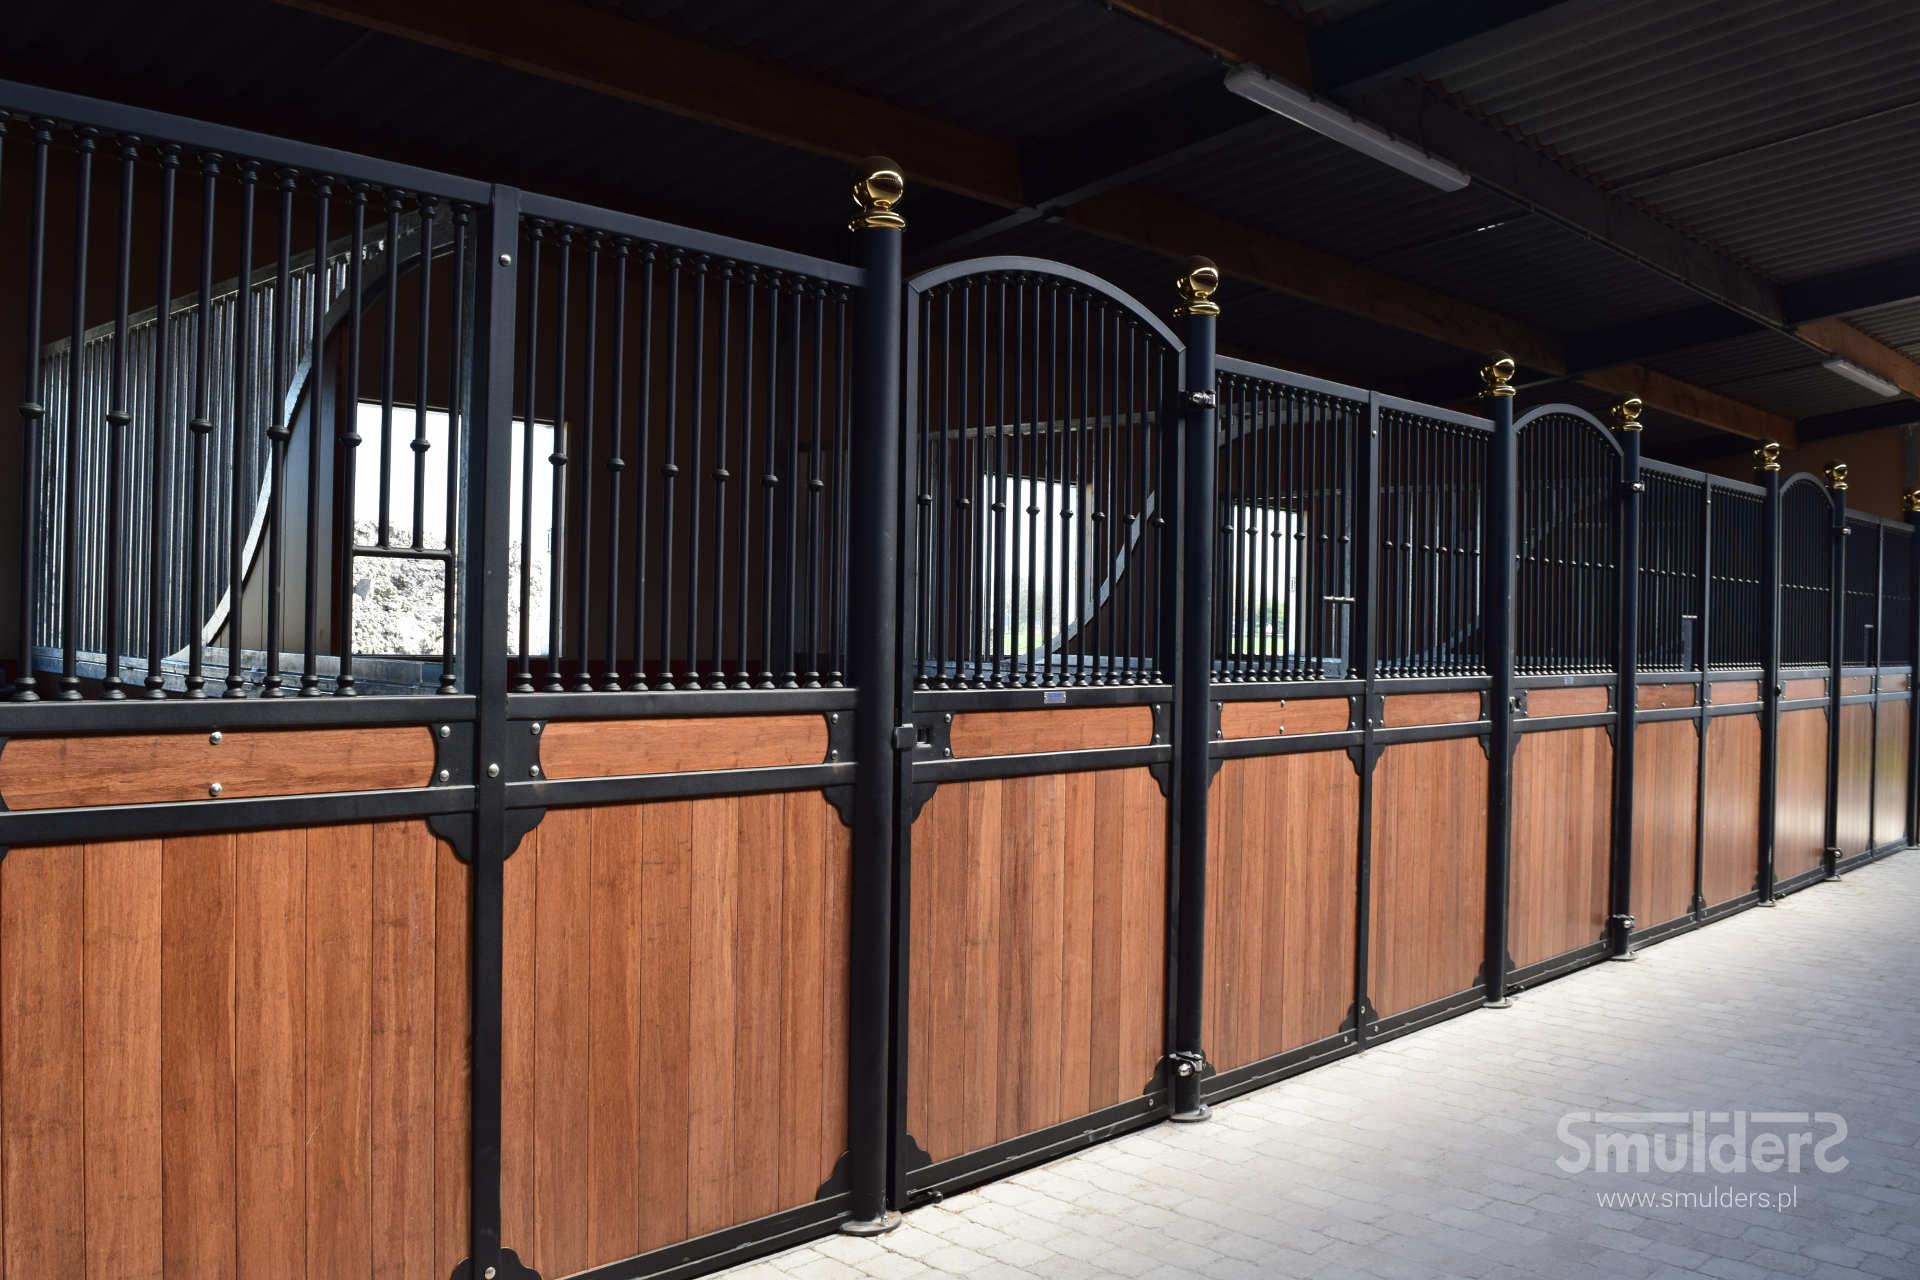 https://www.smulders.pl/wp-content/uploads/2019/03/f002_internal-stables_windsor_doors_windows_barn-doors_PRSH_SMULDERS_PL.jpg